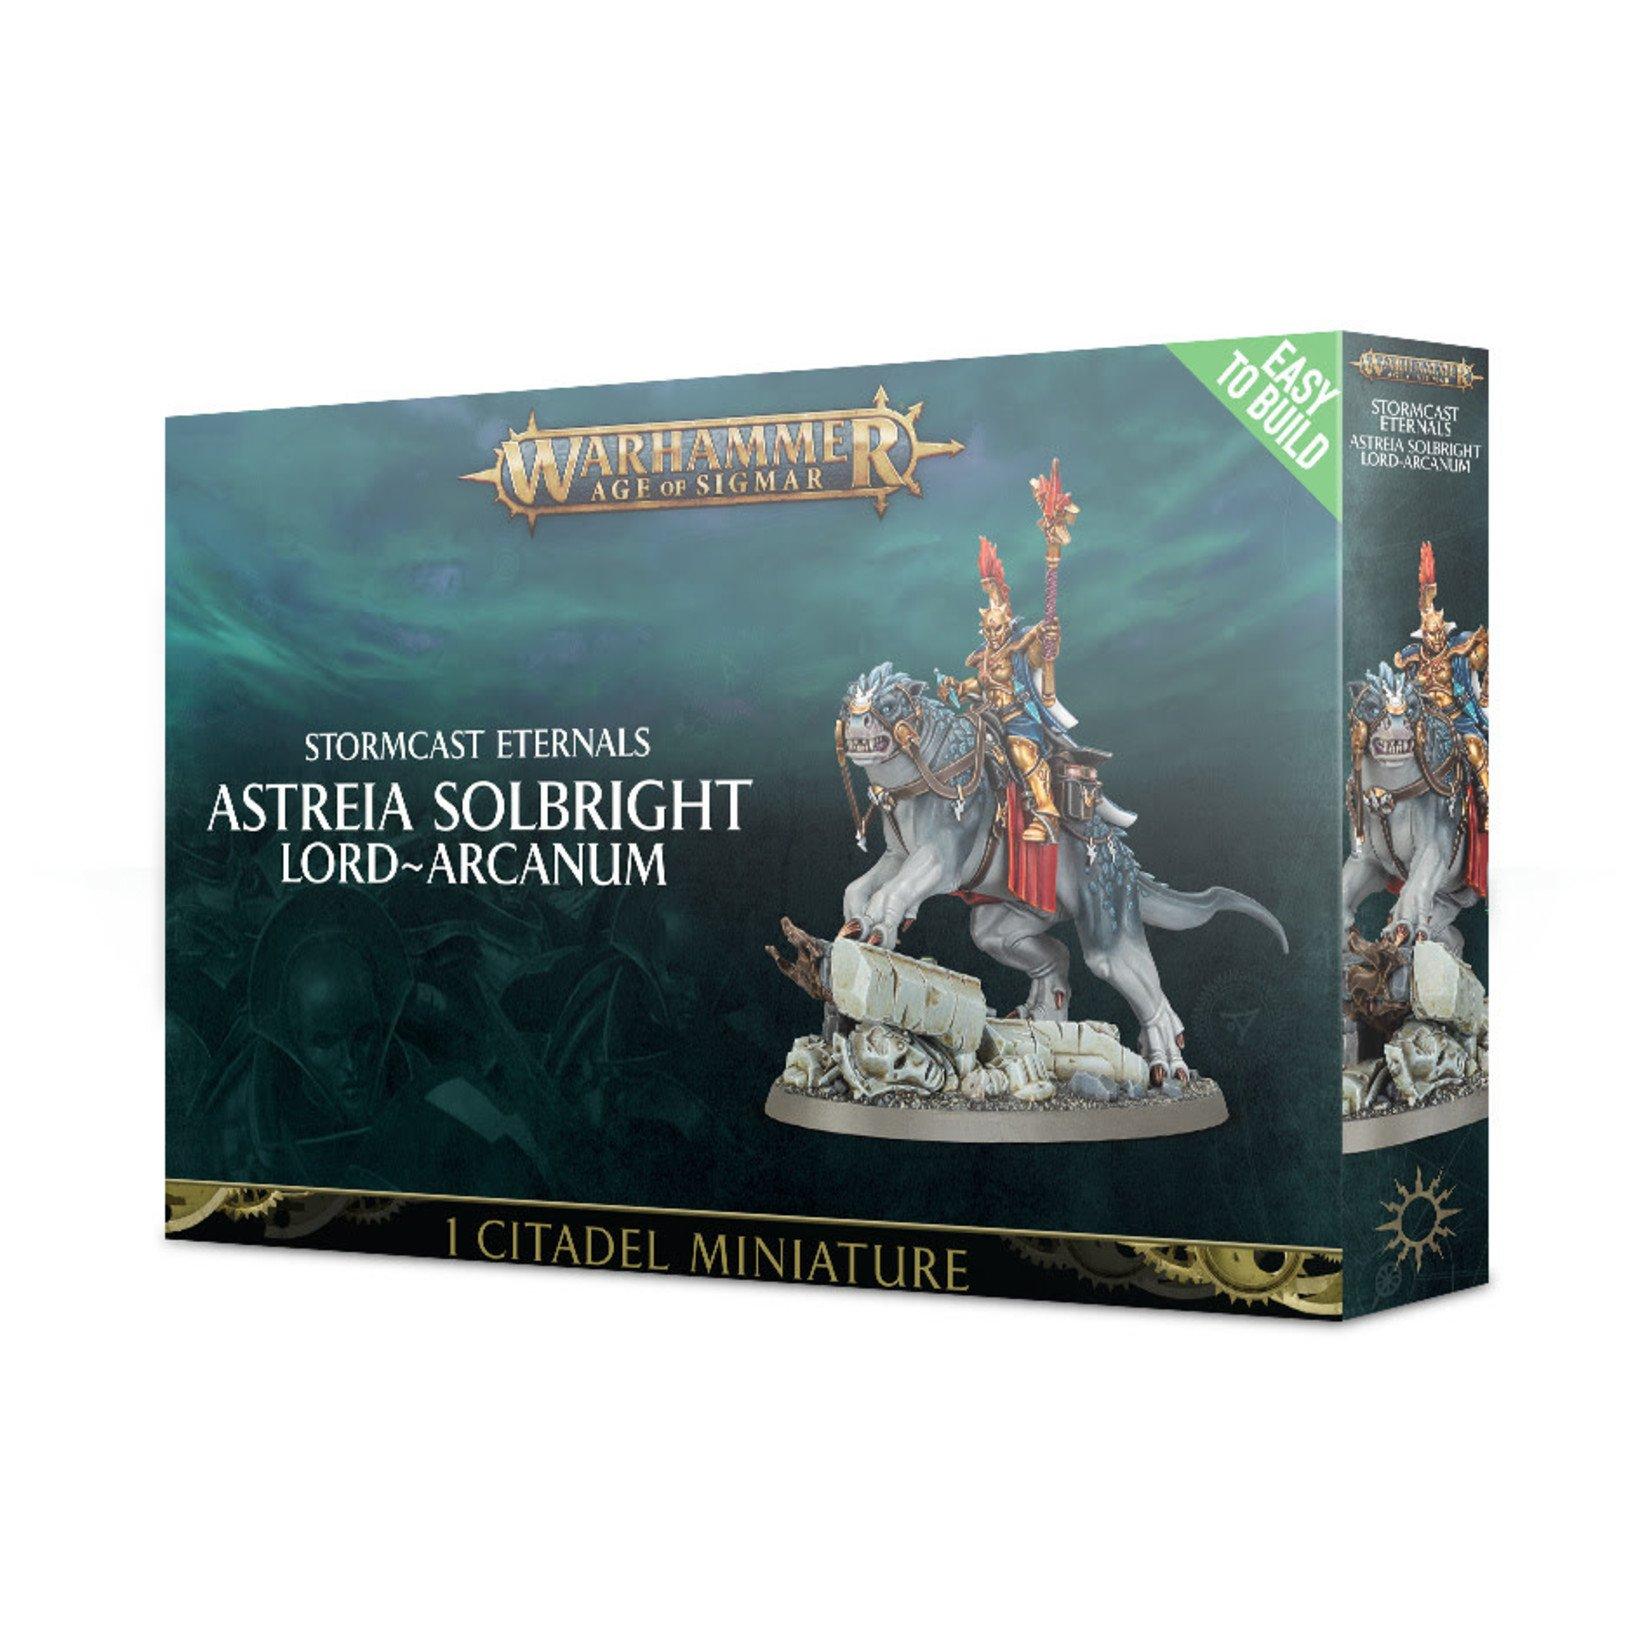 Games Workshop Astreia Solbright, Lord-Arcanum